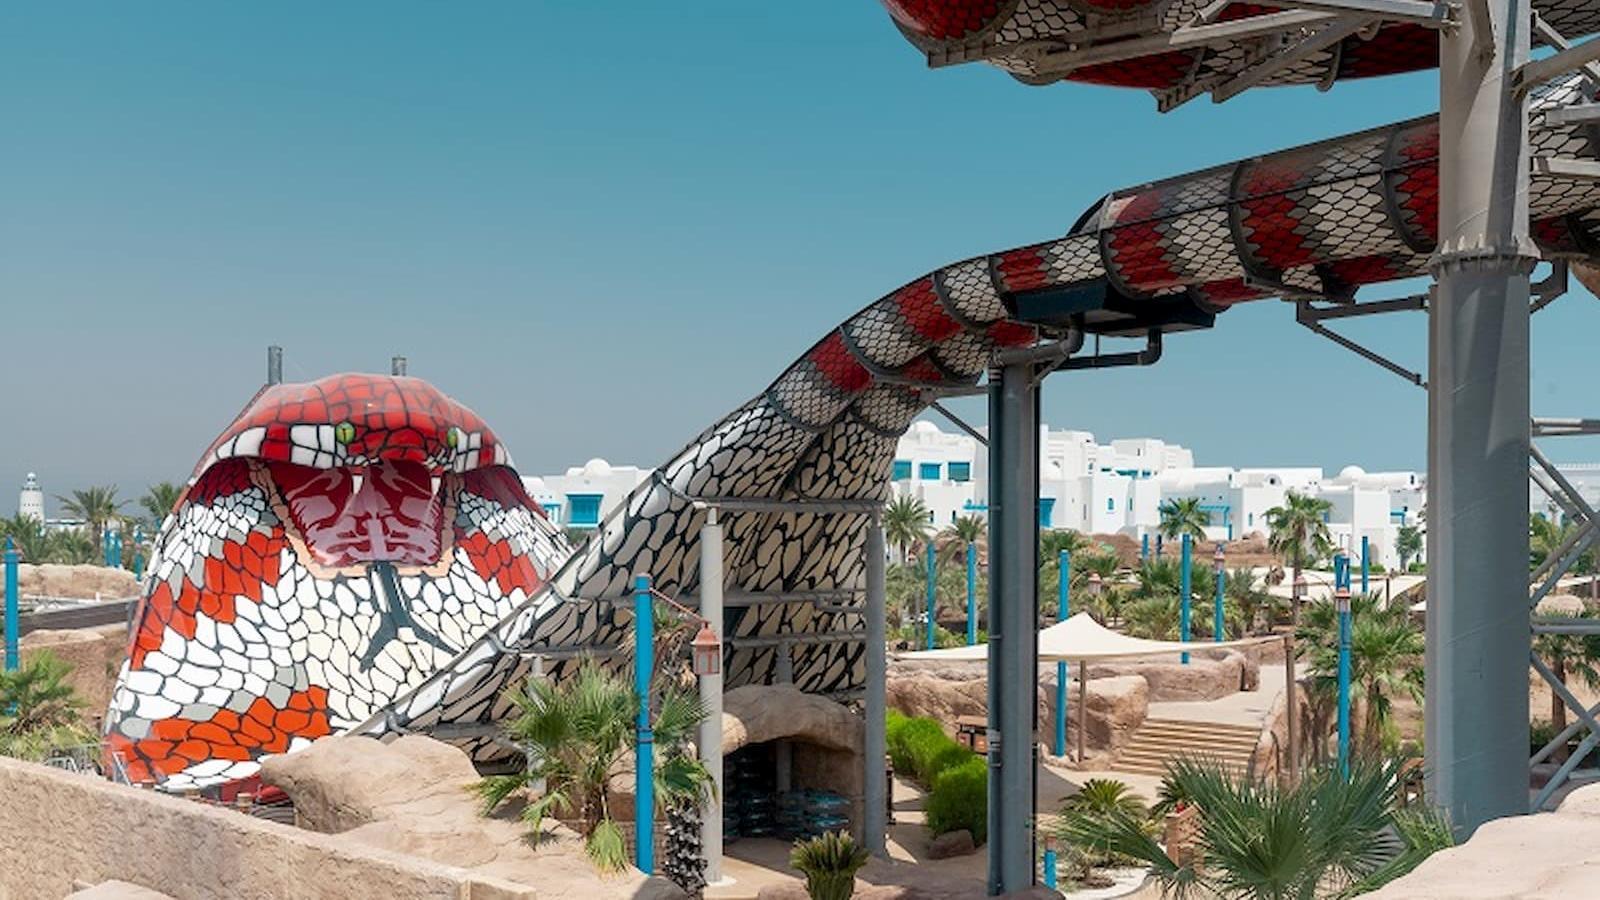 Exhilarating adventures await you at Desert Falls Water & Adventure Park